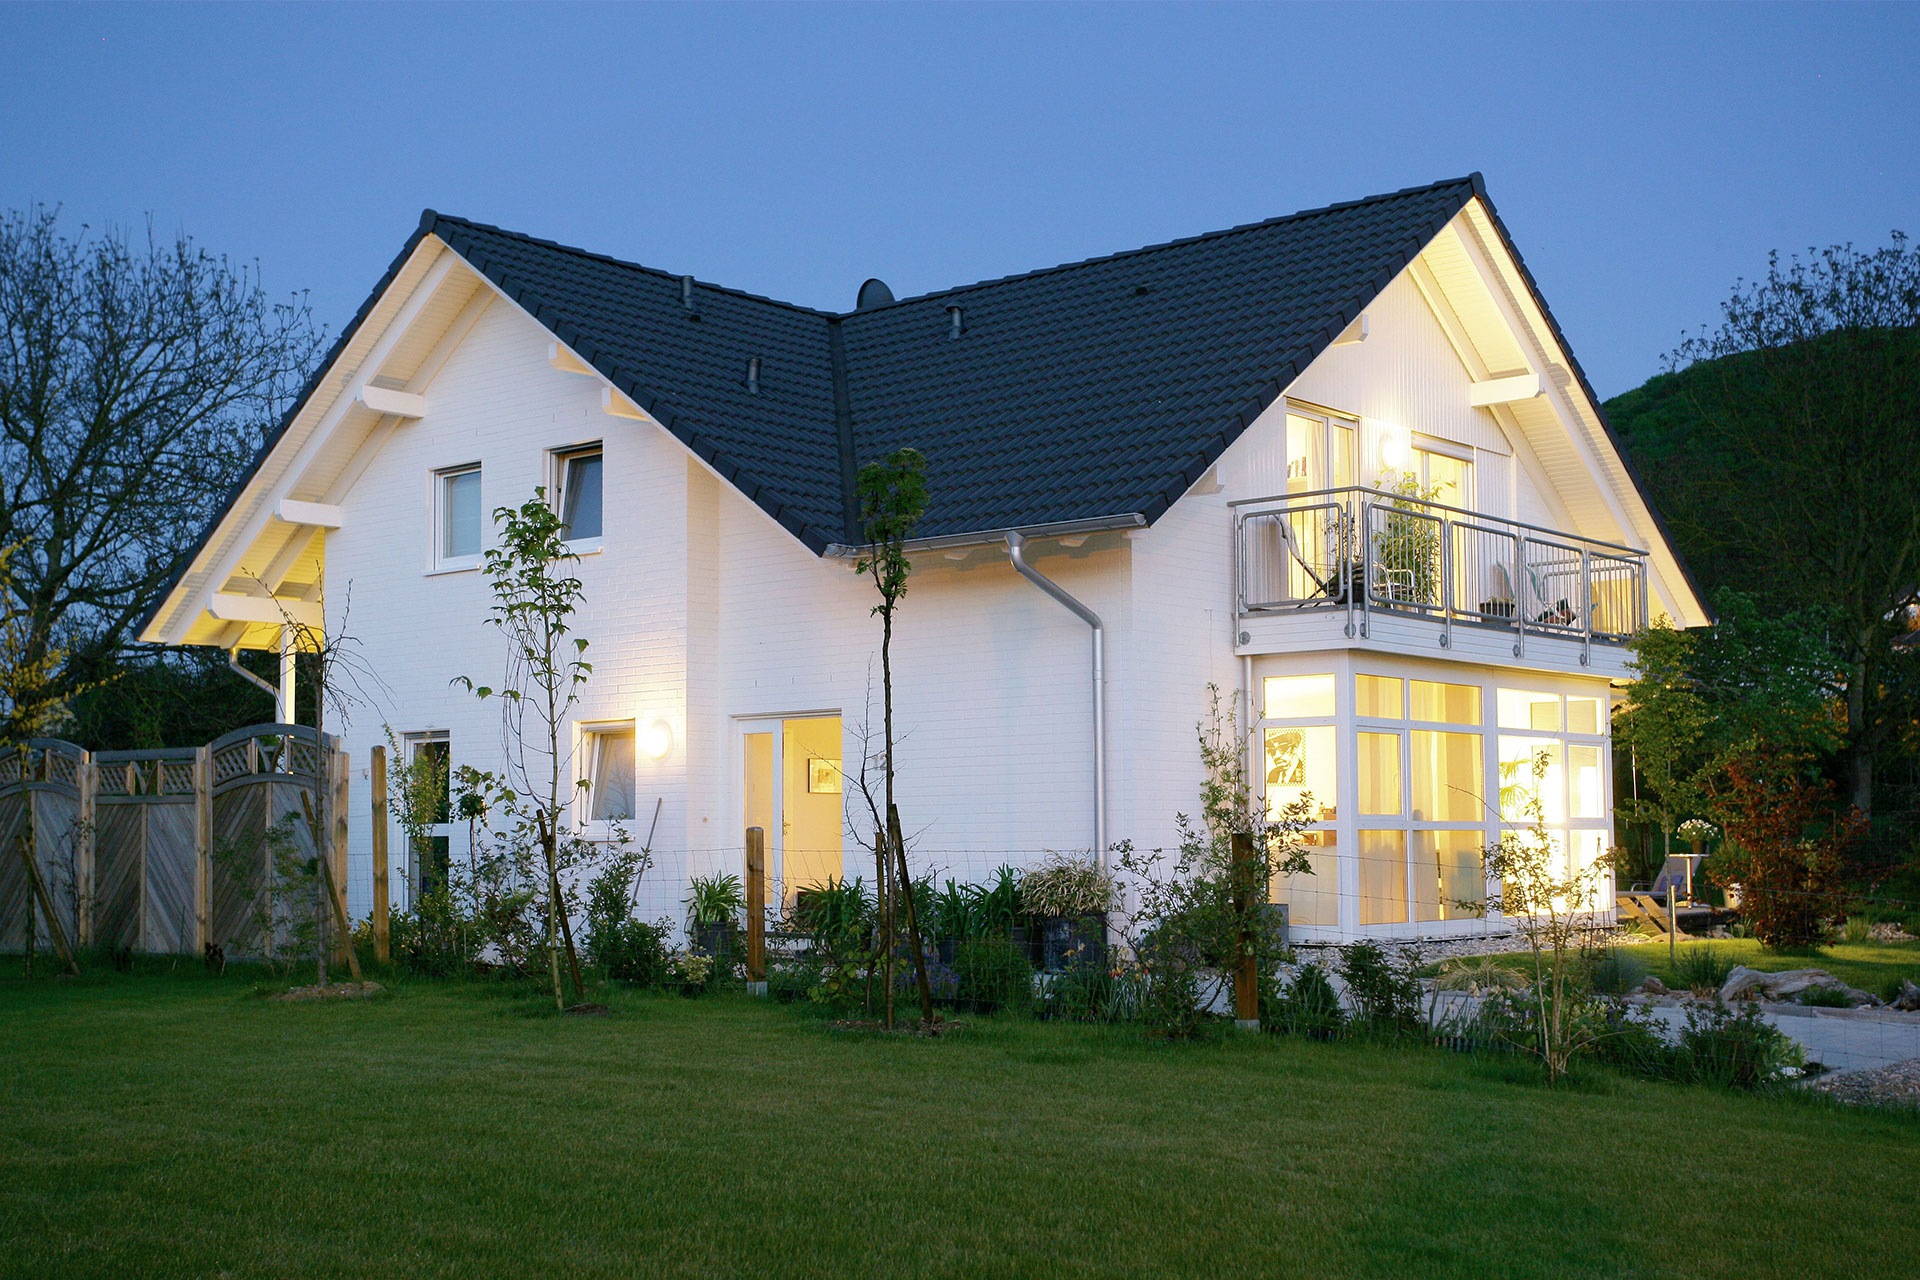 bungalow landhaus tessin ein fertighaus von gussek haus. Black Bedroom Furniture Sets. Home Design Ideas